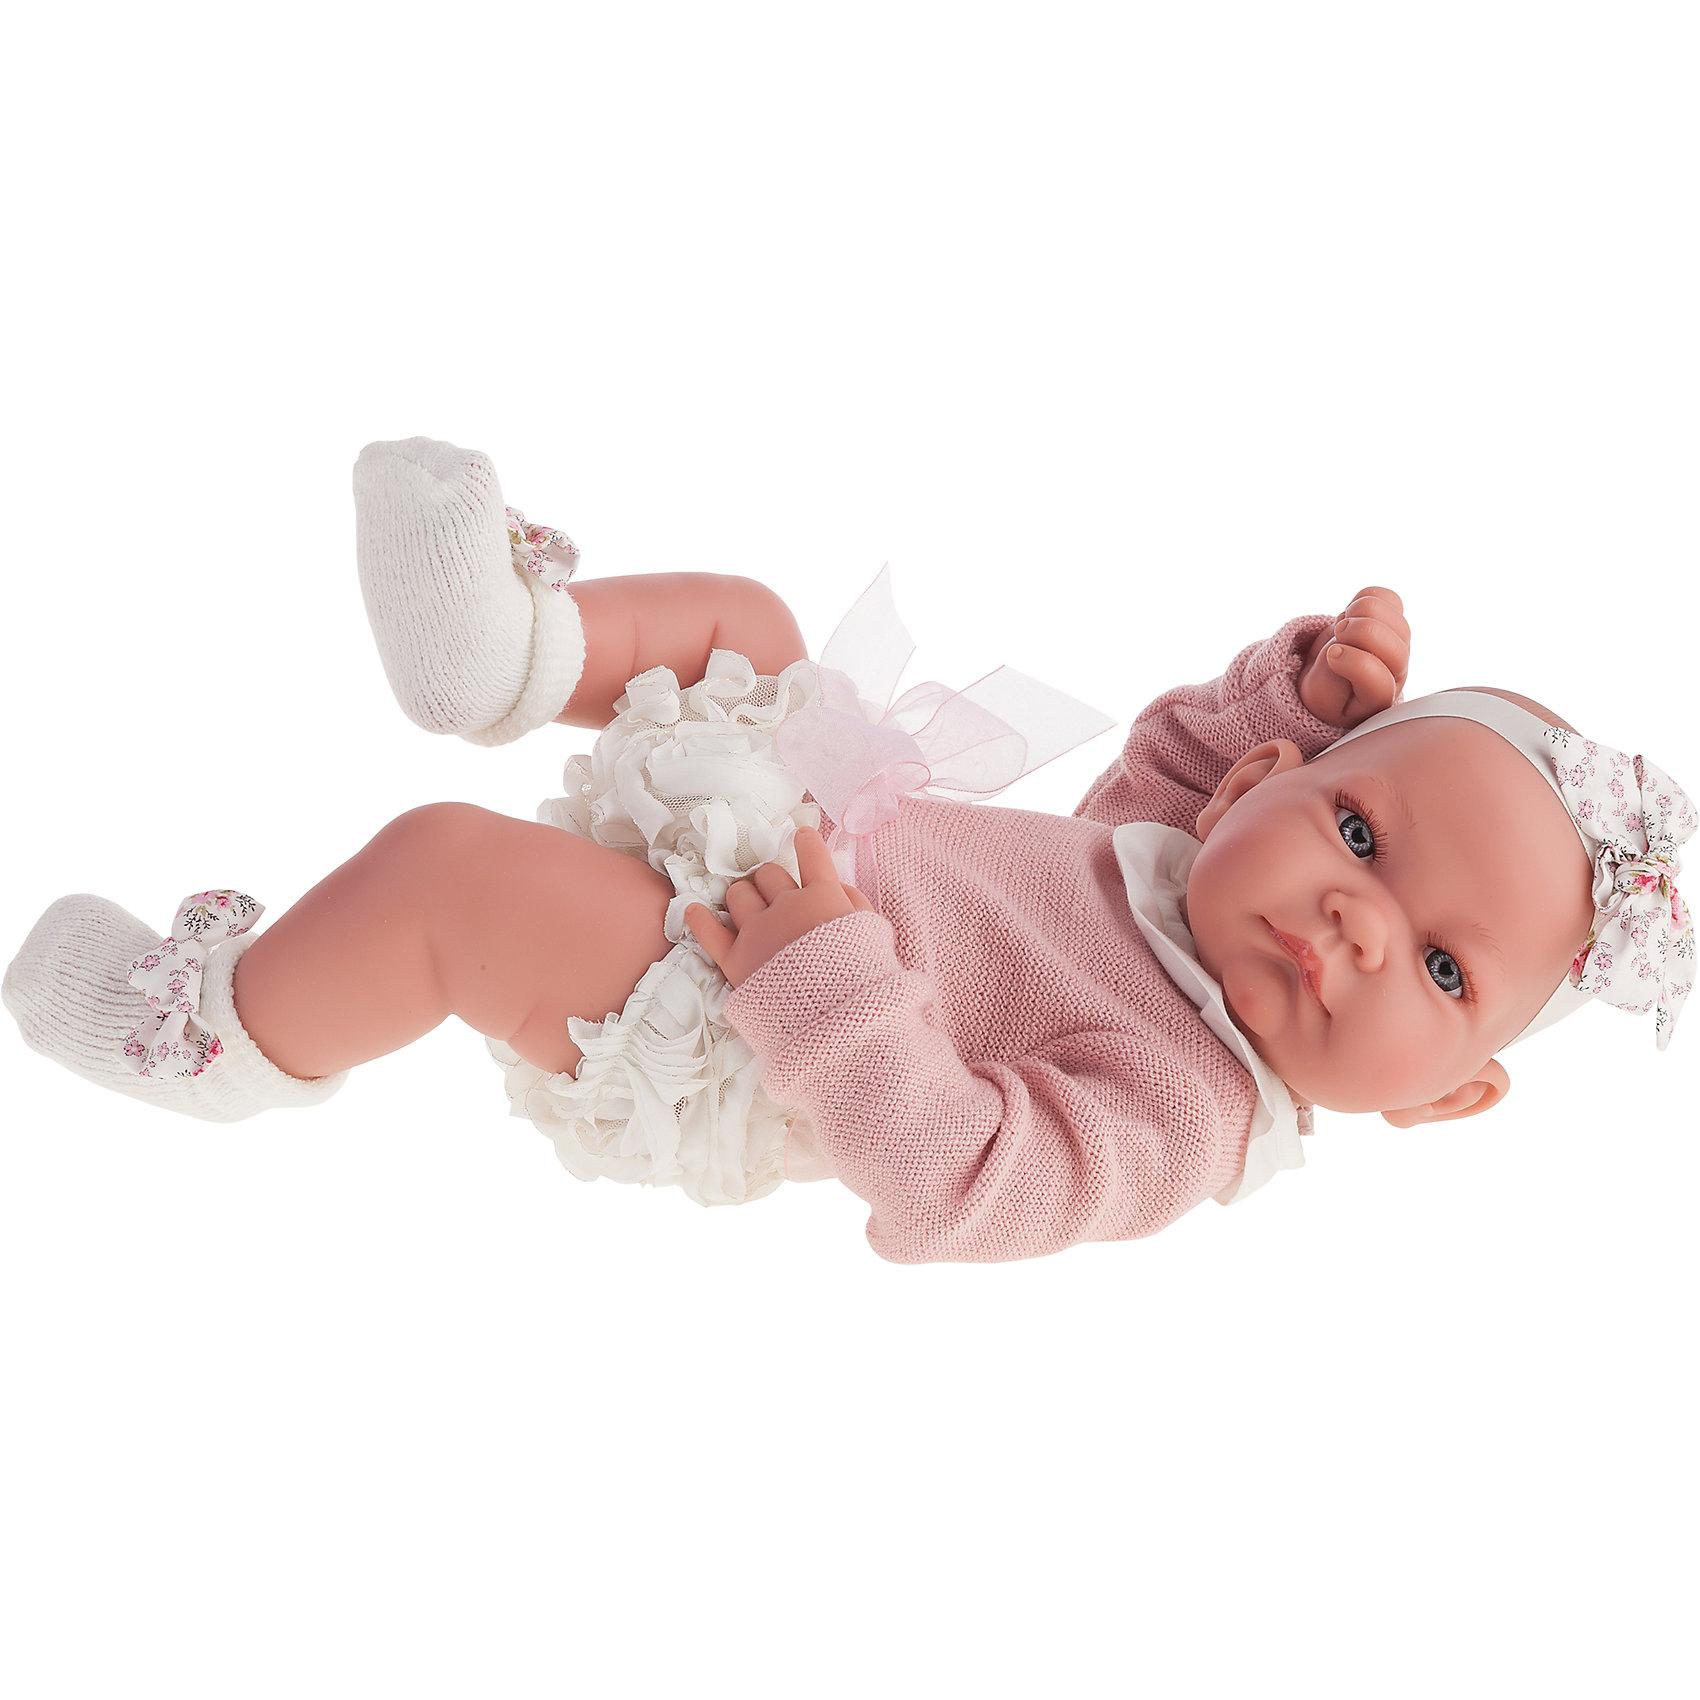 Munecas Antonio Juan Кукла-младенец Эмма, 42 см, Munecas Antonio Juan munecas antonio juan кукла младенец карлос в конверте голубой 26 см munecas antonio juan